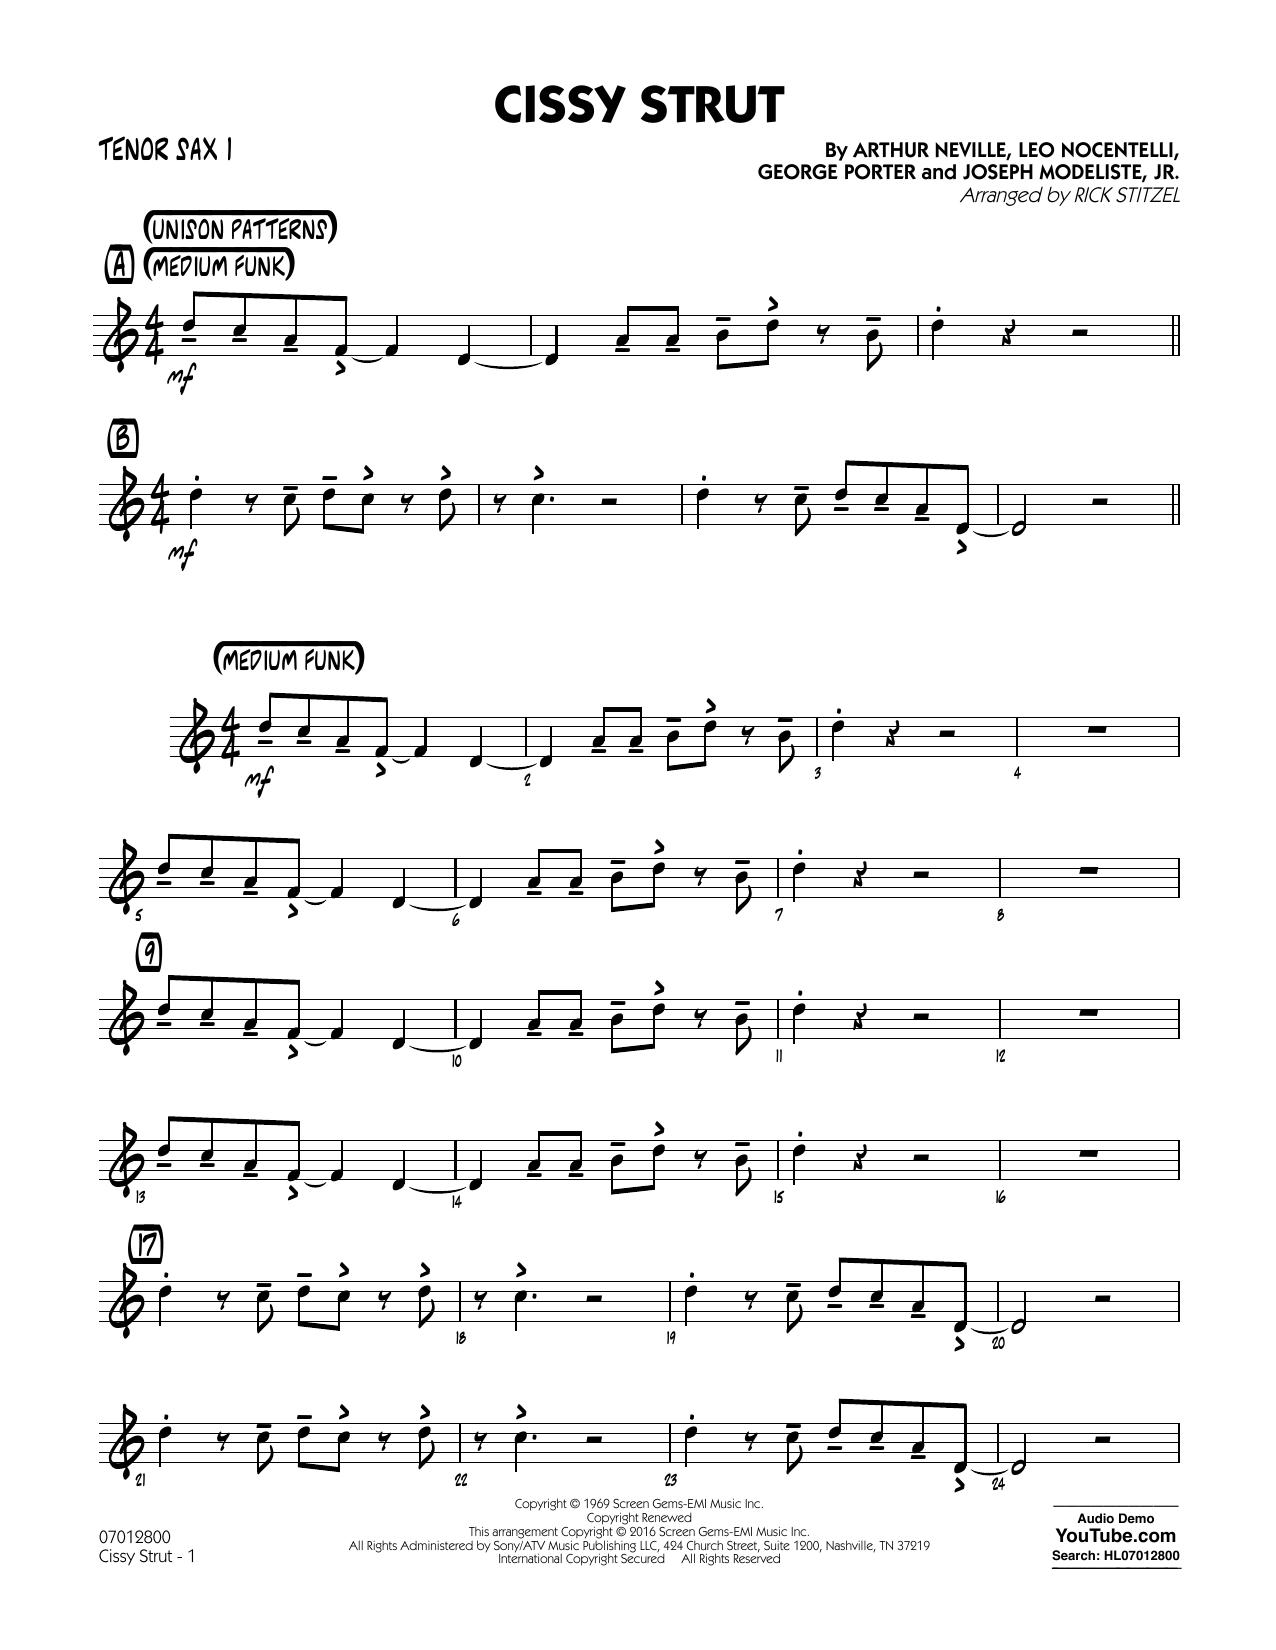 Rick Stitzel Cissy Strut - Tenor Sax 1 sheet music notes and chords. Download Printable PDF.